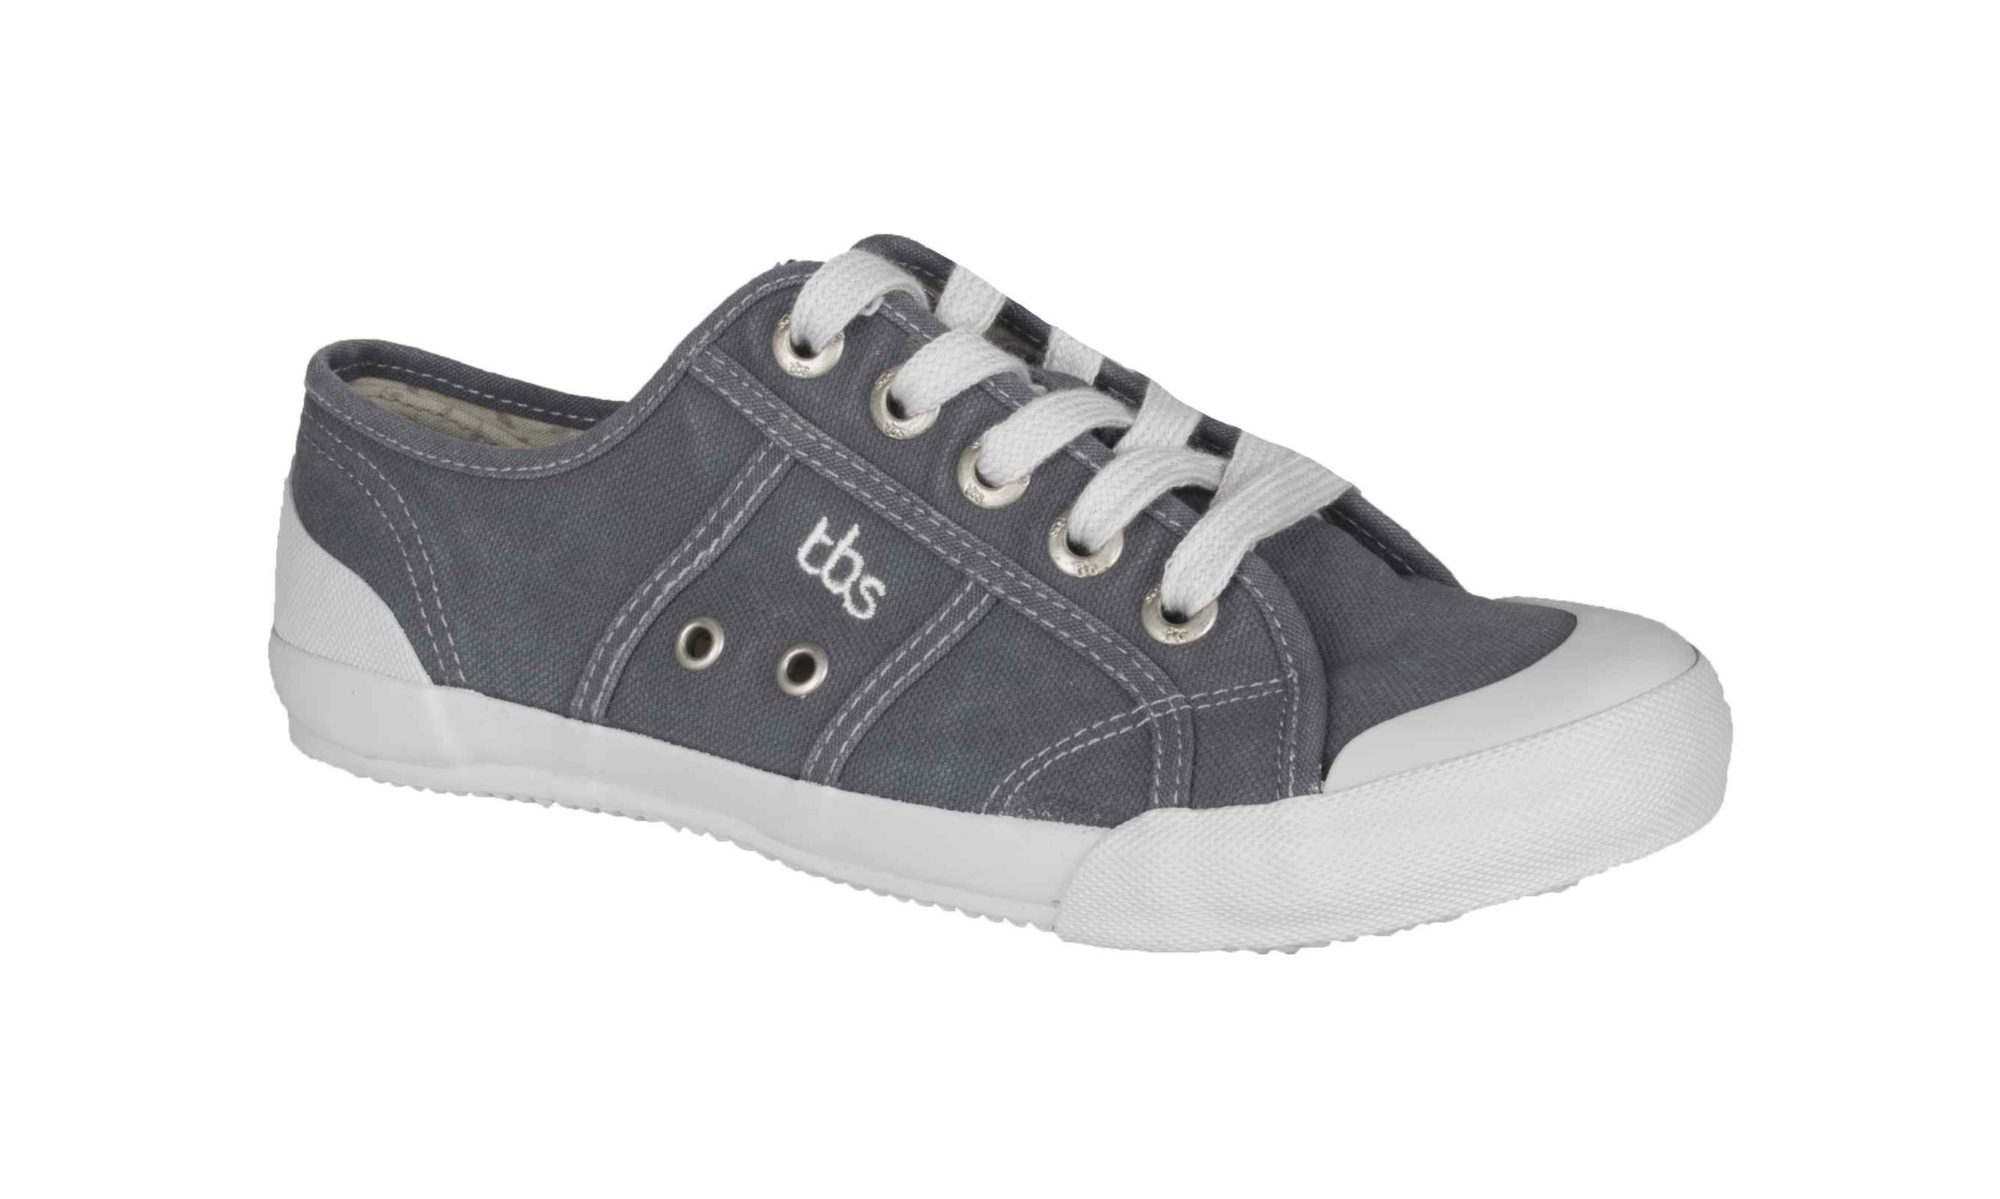 5b211fbd36e23 Opiace S7061 Tige Basse Lacet Grey - Katie Kerr - Women s Clothing - UK